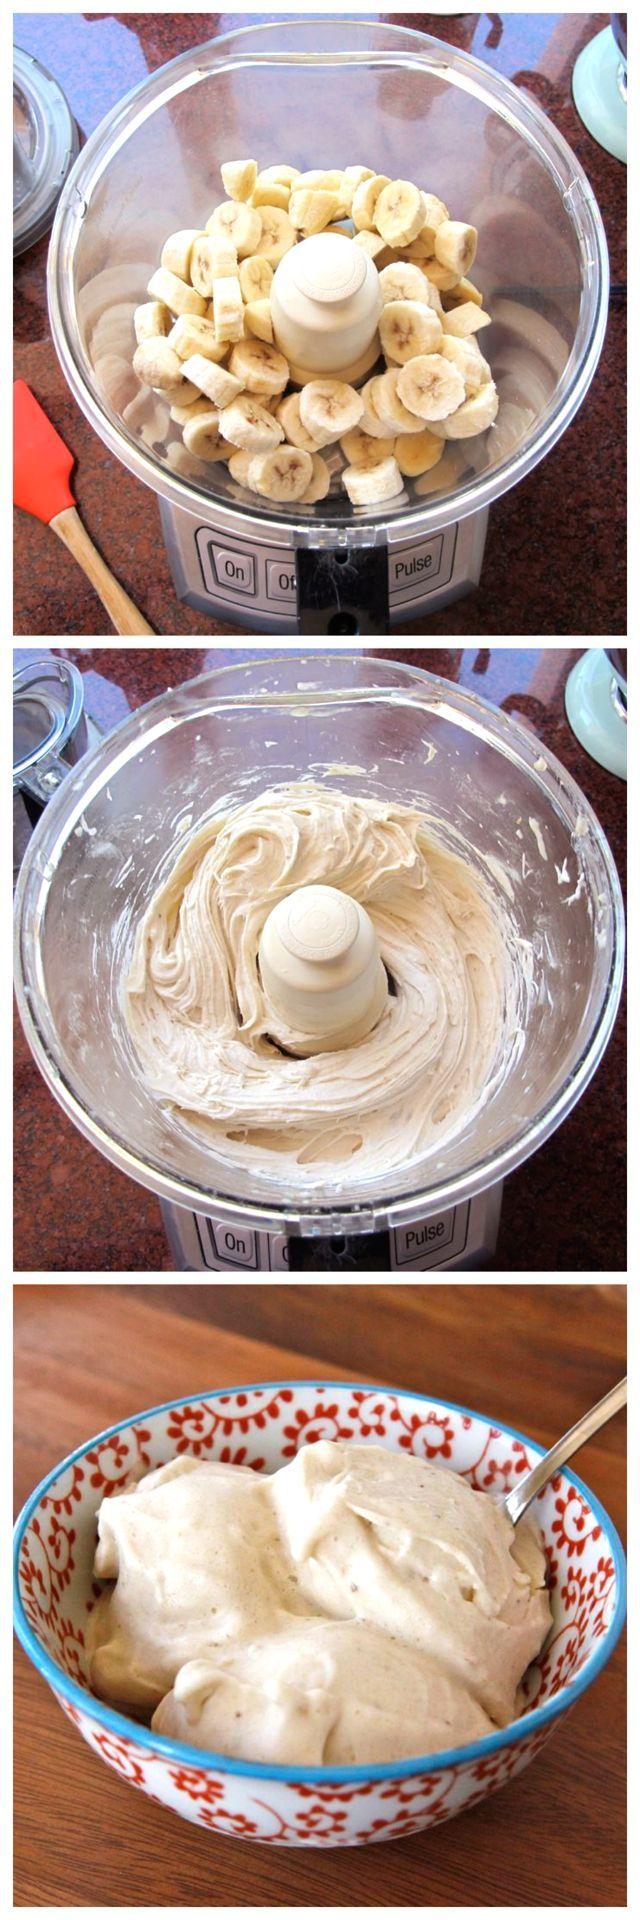 "Banana Soft Serve - Recipe for One-Ingredient Food Processor Banana ""Ice Cream"" - Creamy All Natural Dairy Free Dessert"